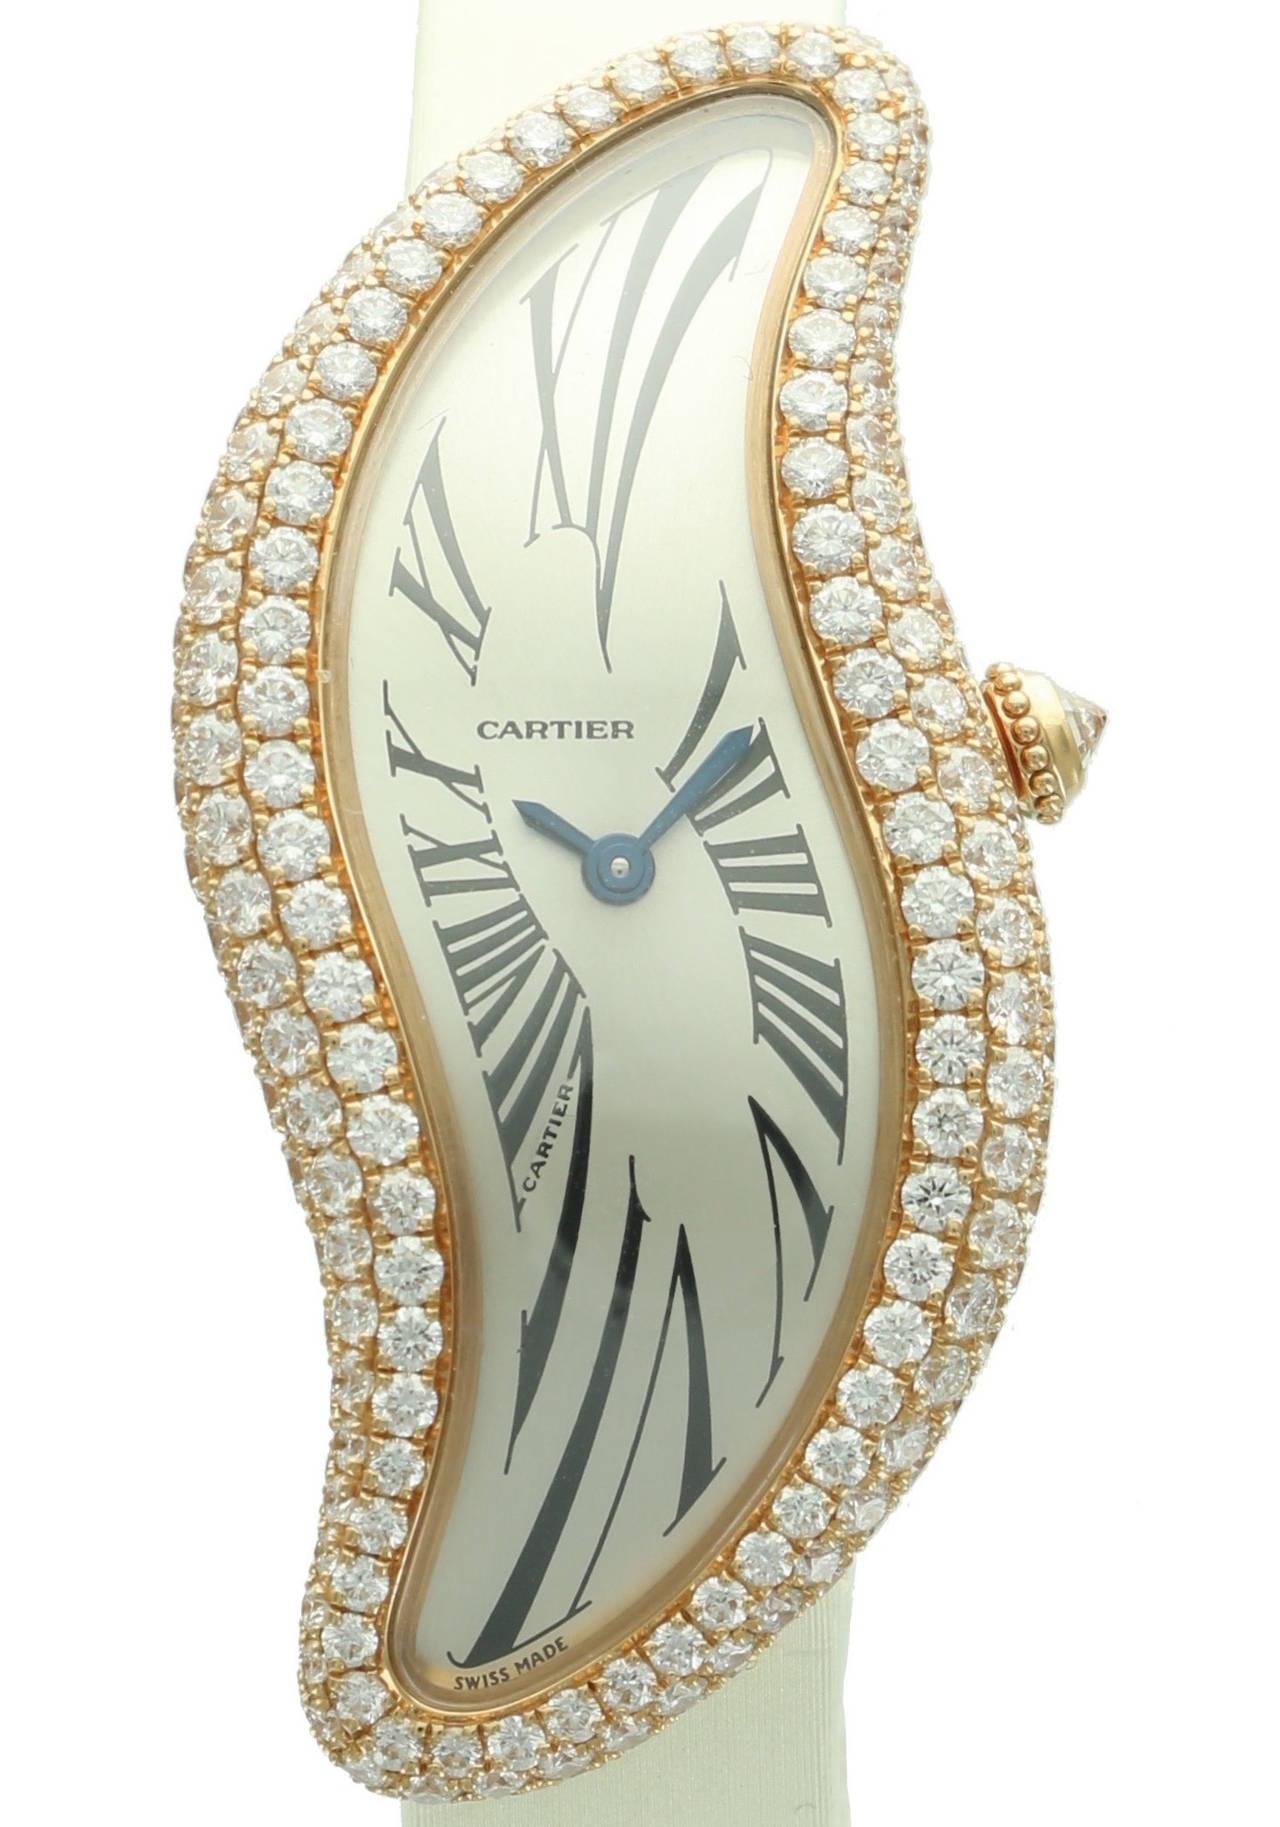 Cartier Lady's Rose Gold Baignoire Wristwatch Ref 3248 2